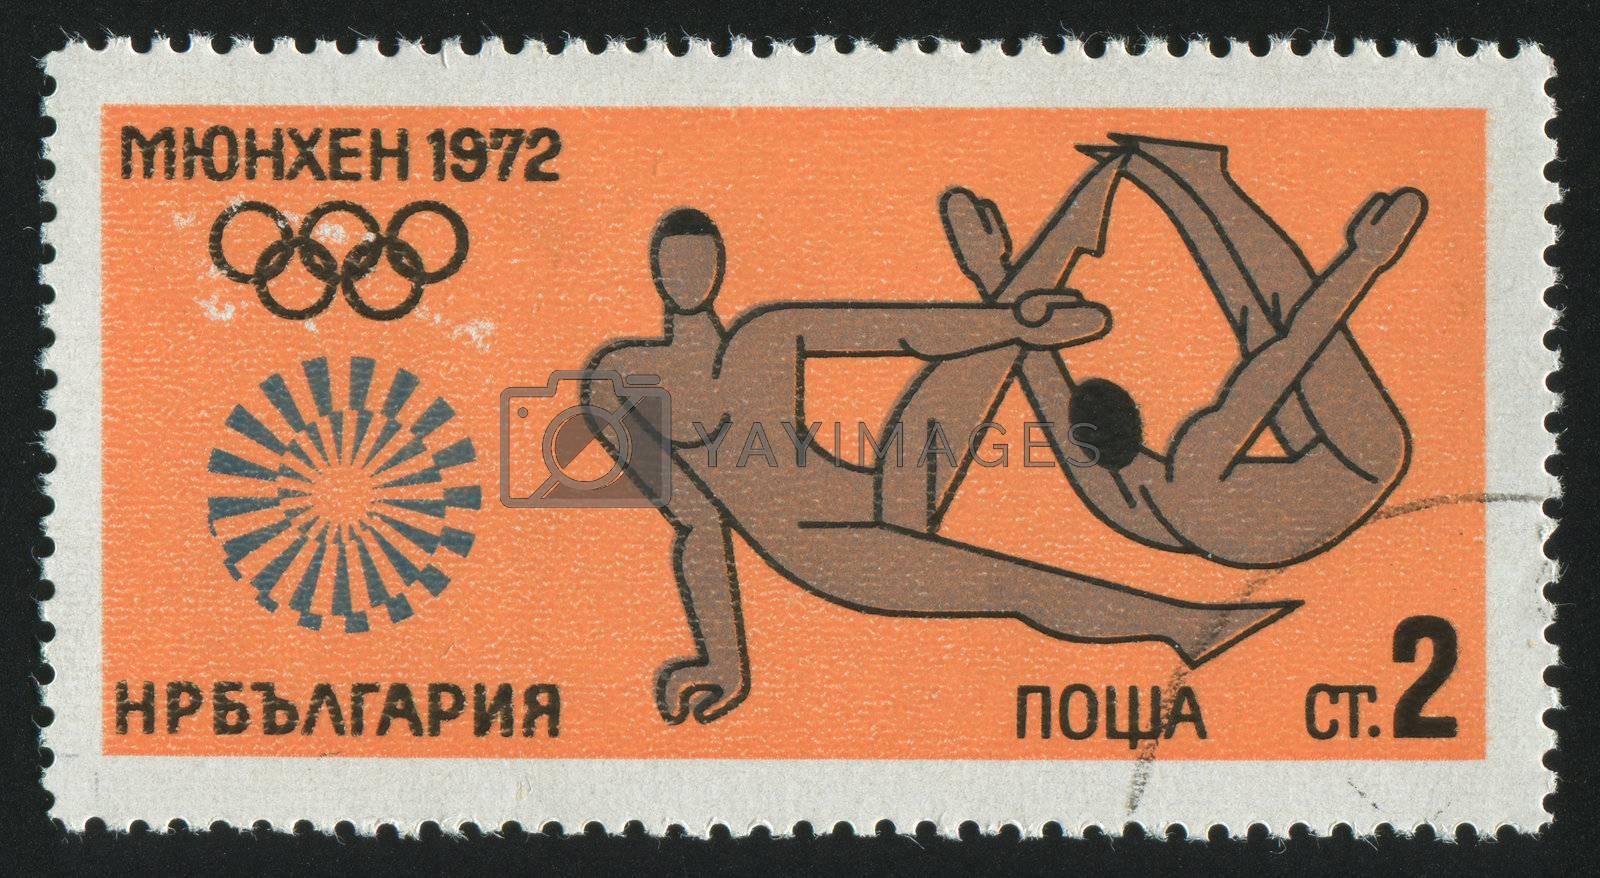 BULGARIA - CIRCA 1972: stamp printed by Bulgaria, shows gymnastics, circa 1972.